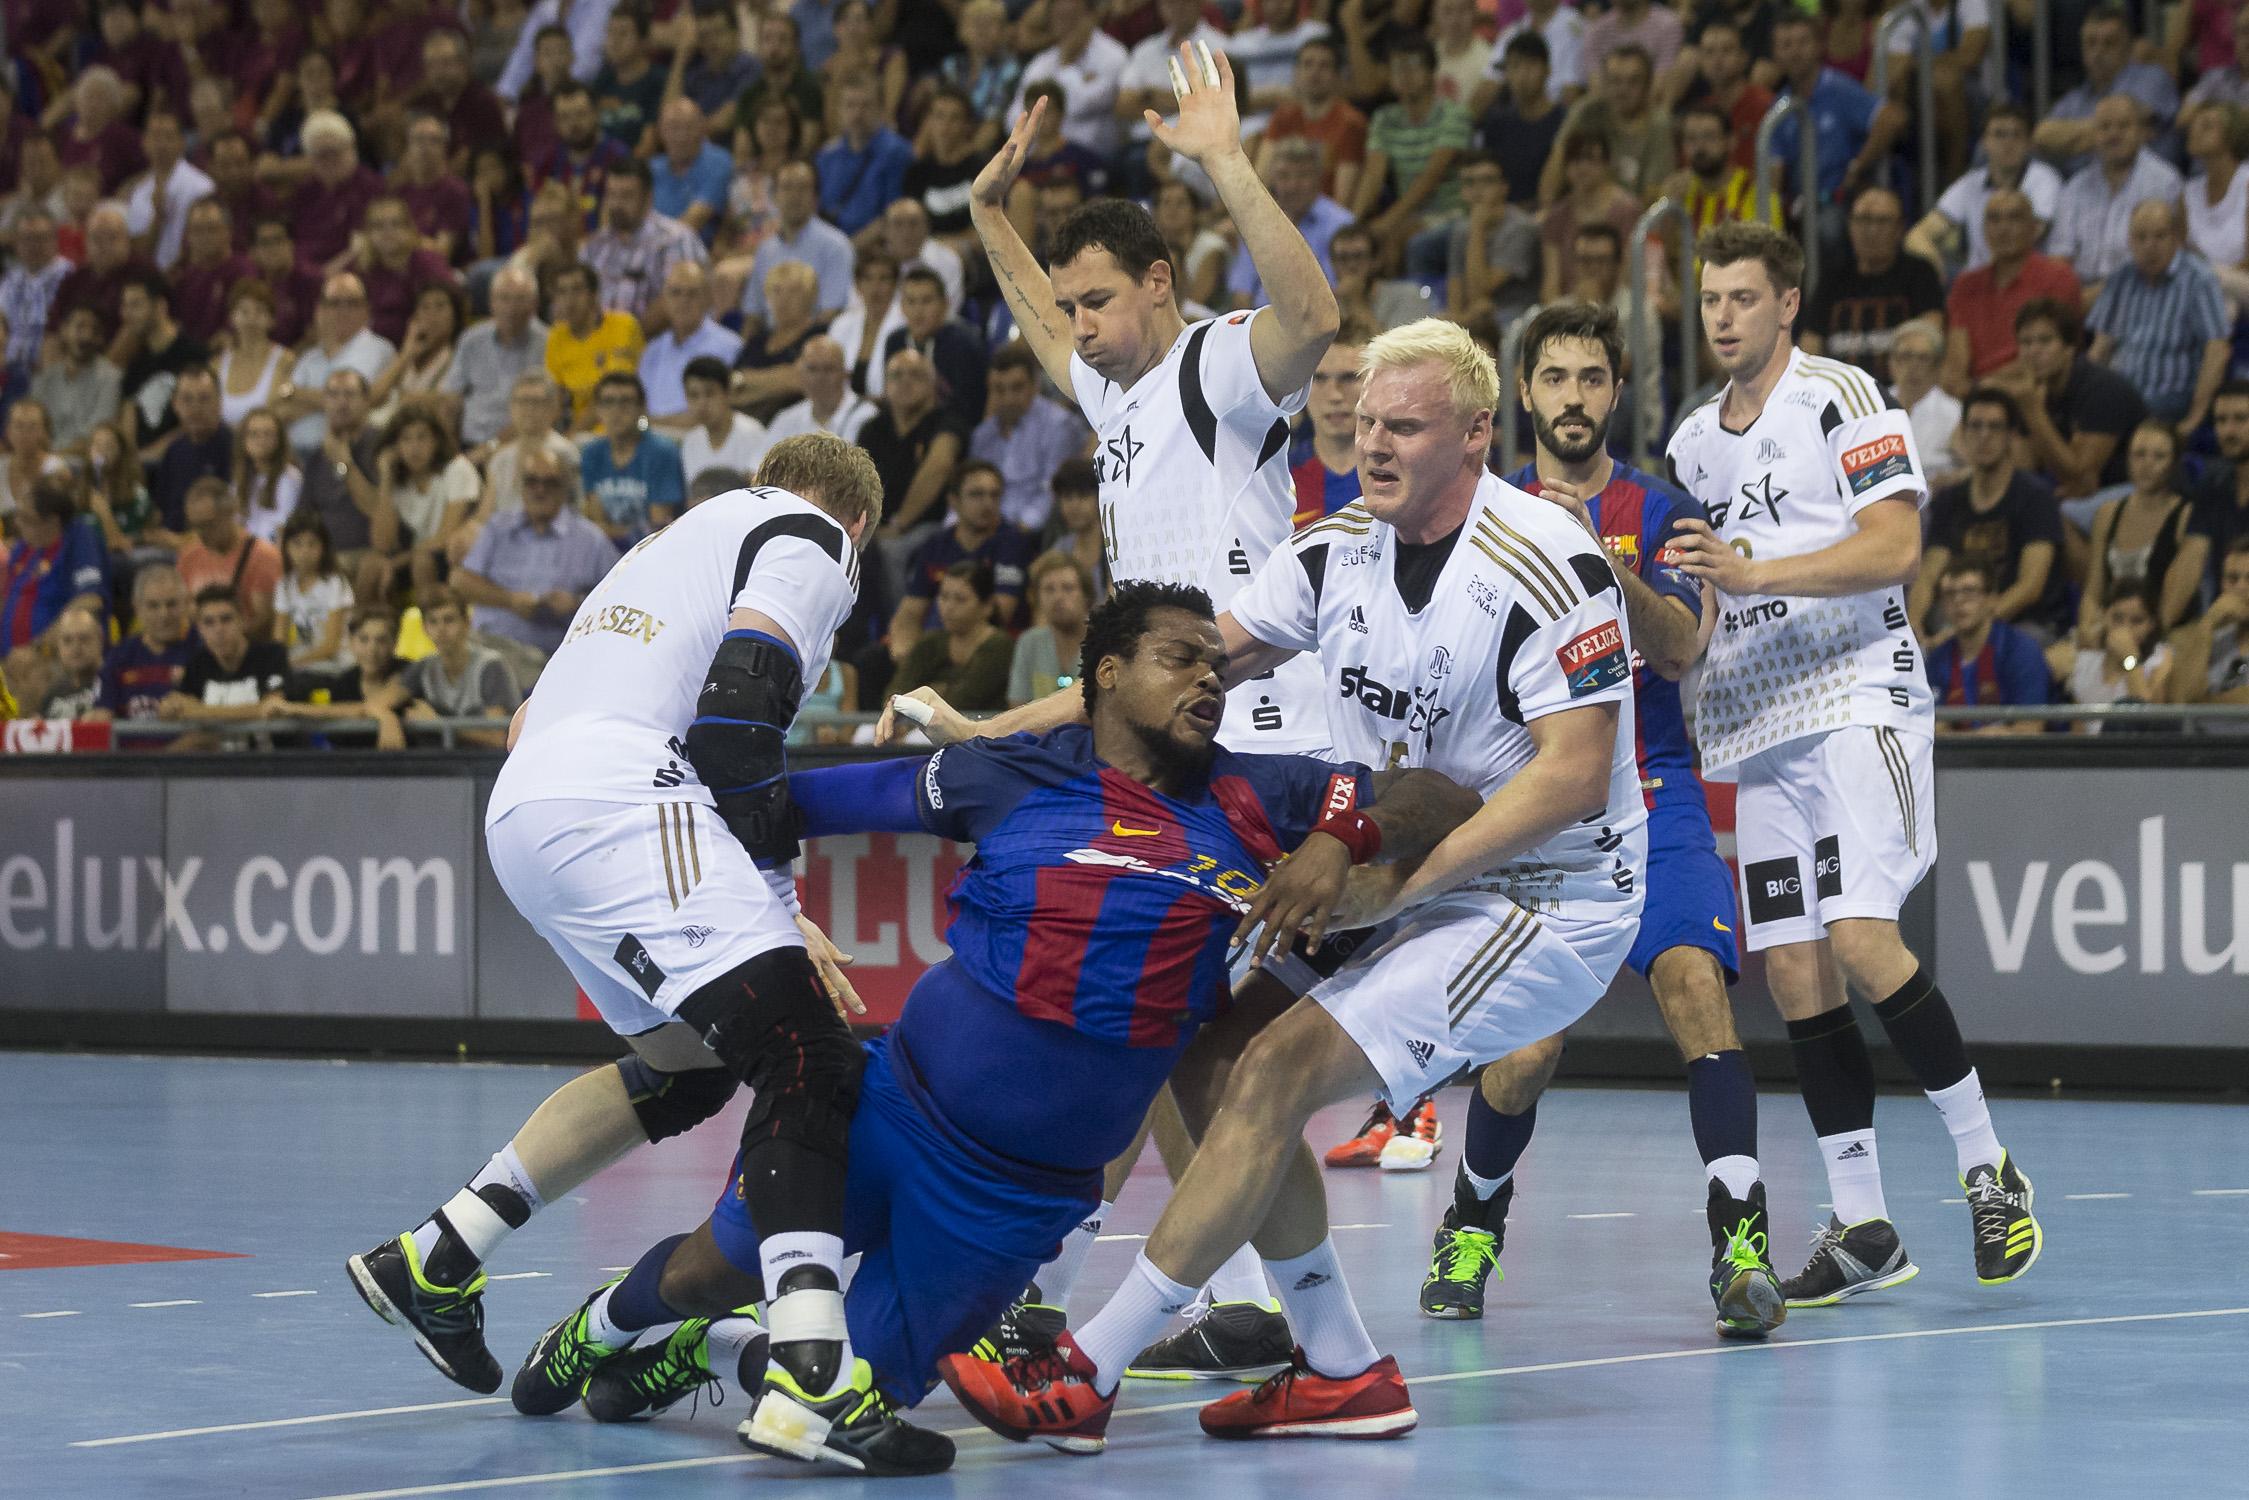 portfolio20161001-handball-cl-barca-thw-kiel-865-bc3t0146